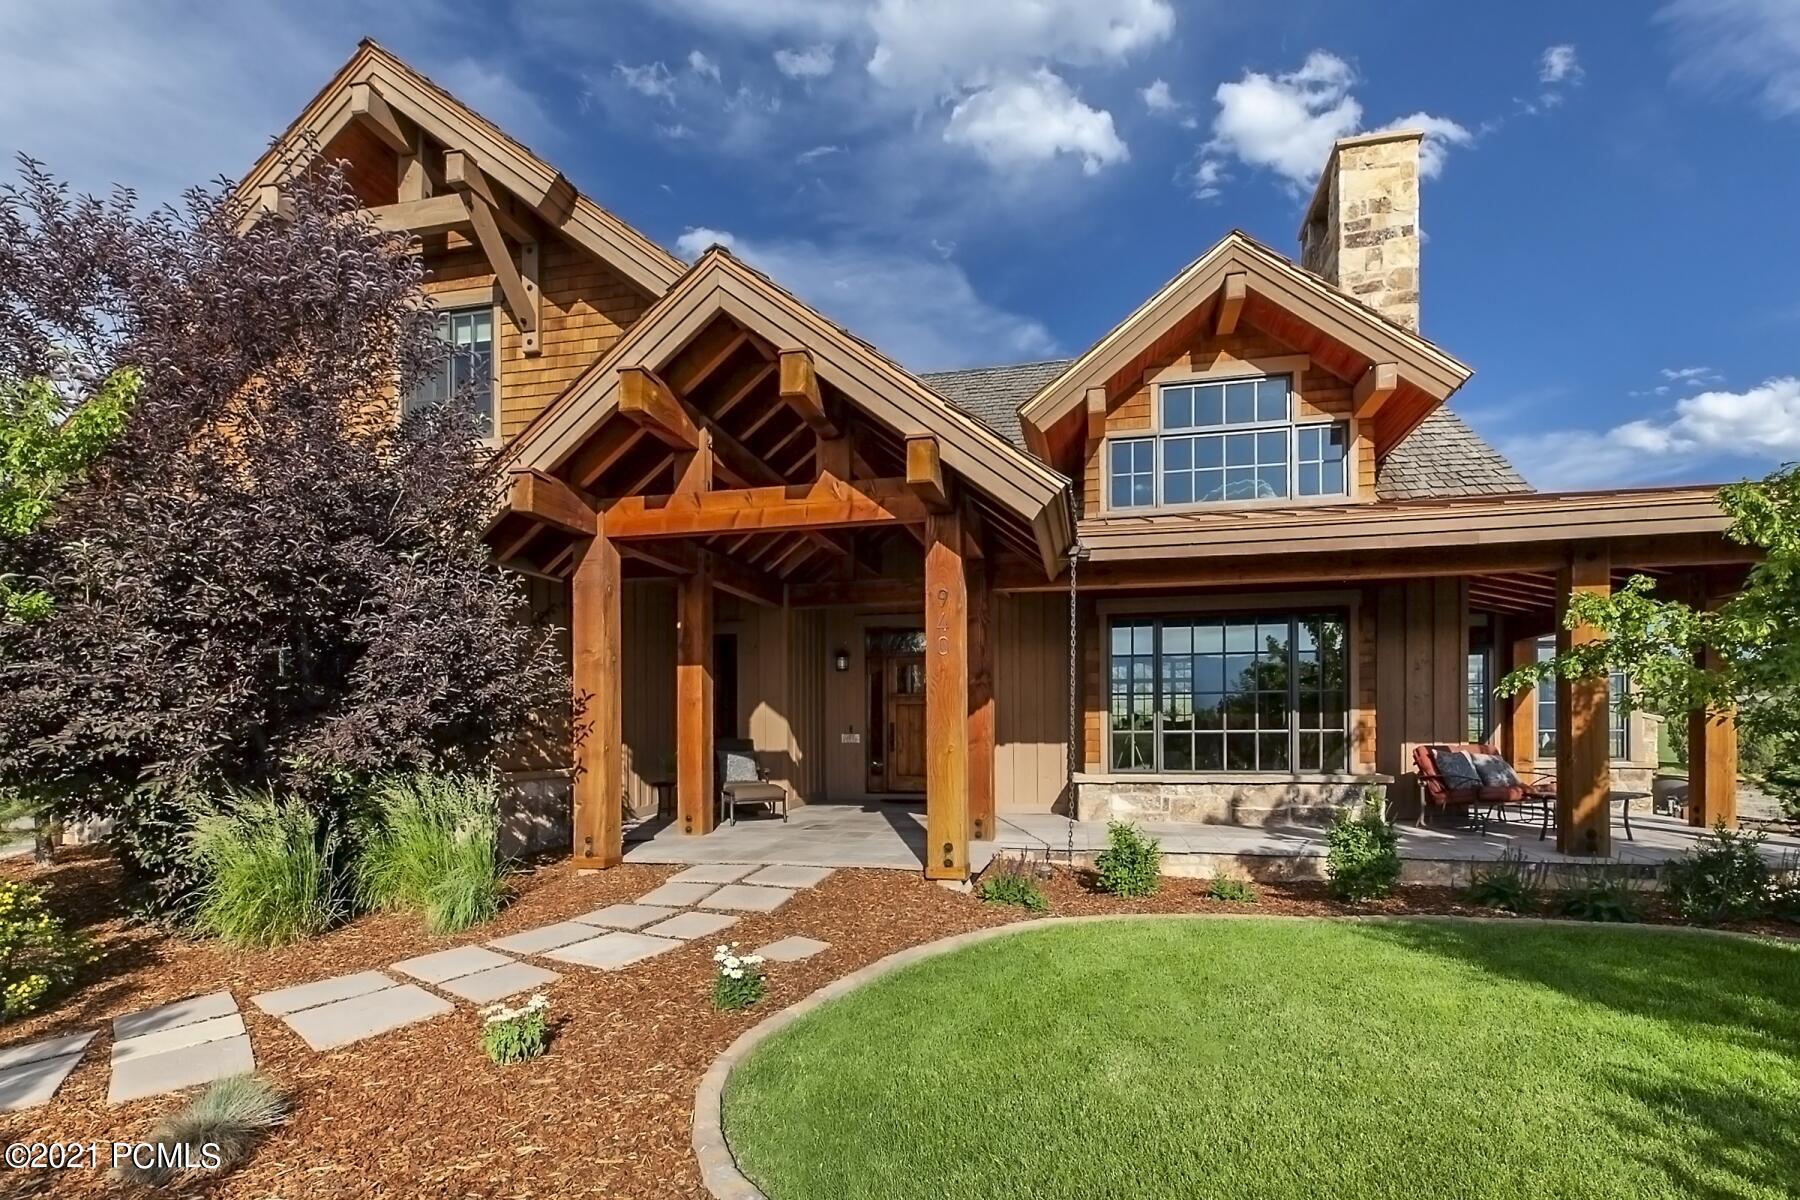 940 Chimney Rock Road, Heber City, Utah 84032, 4 Bedrooms Bedrooms, ,6 BathroomsBathrooms,Single Family,For Sale,Chimney Rock,12102694